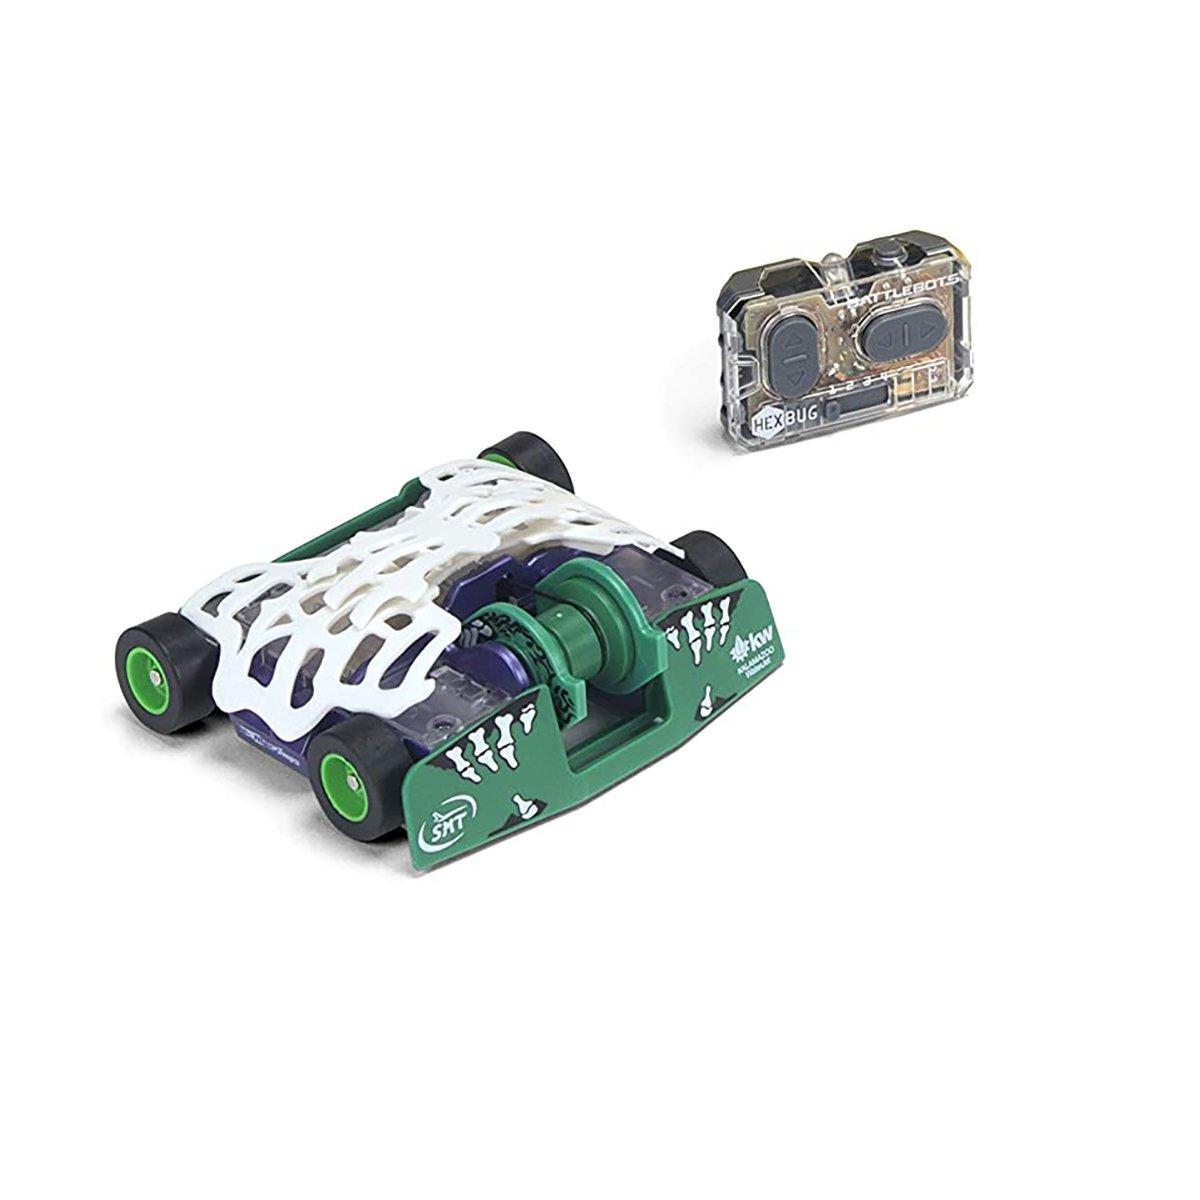 Robot de lupta cu telecomanda BattleBots Hexbug, Witchdoctor, 413-5186